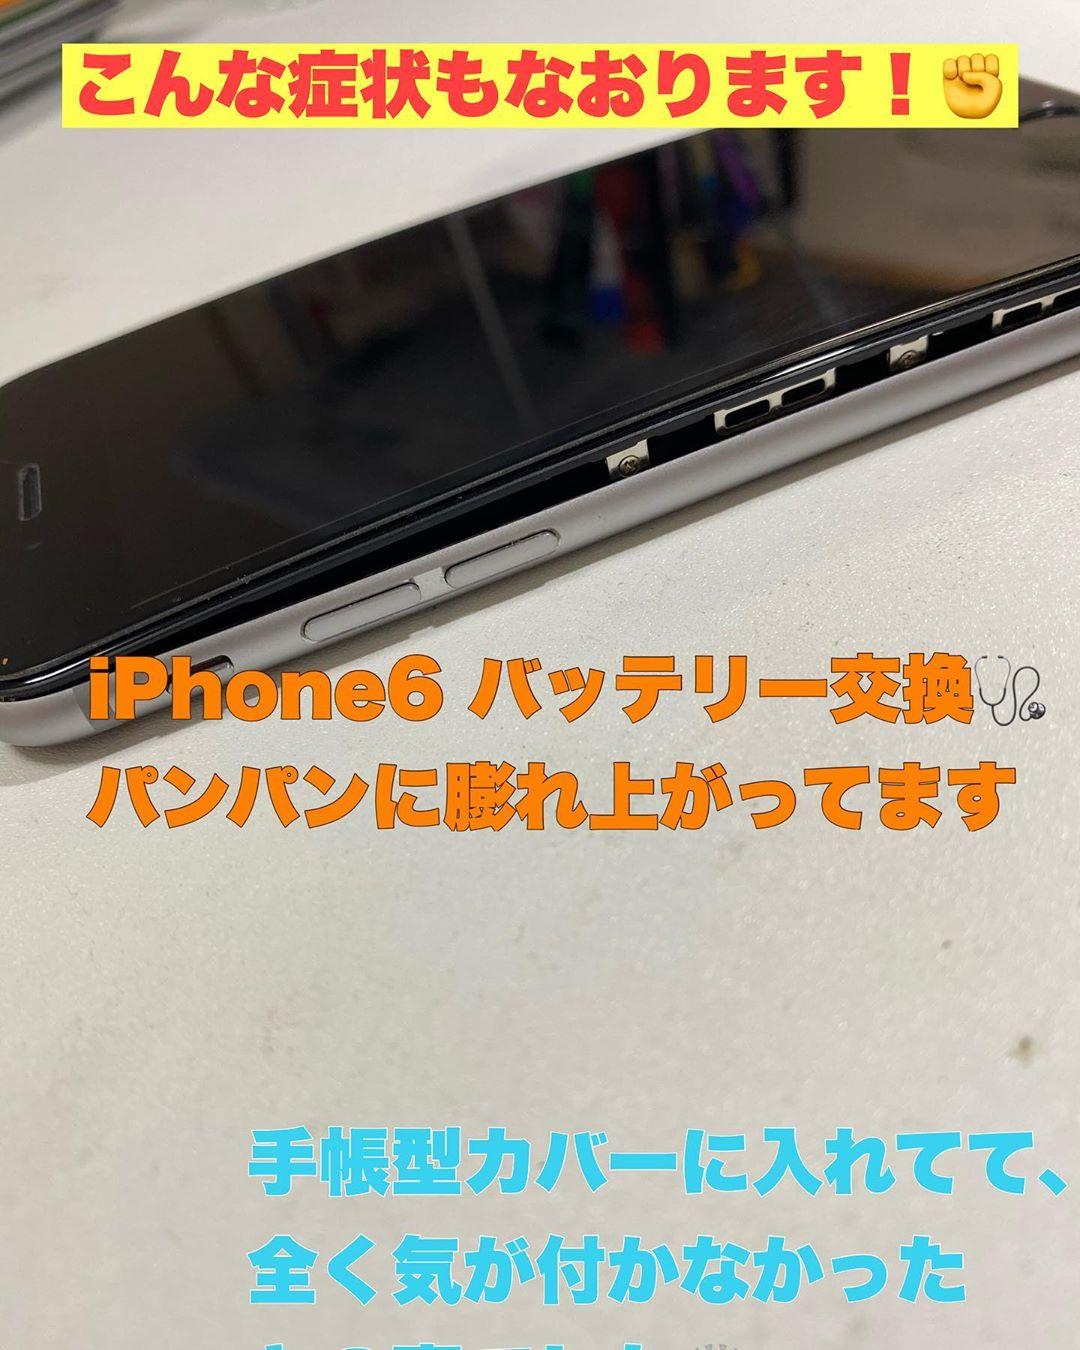 iPhone6 電池交換 ヴィジョン江南駅前店